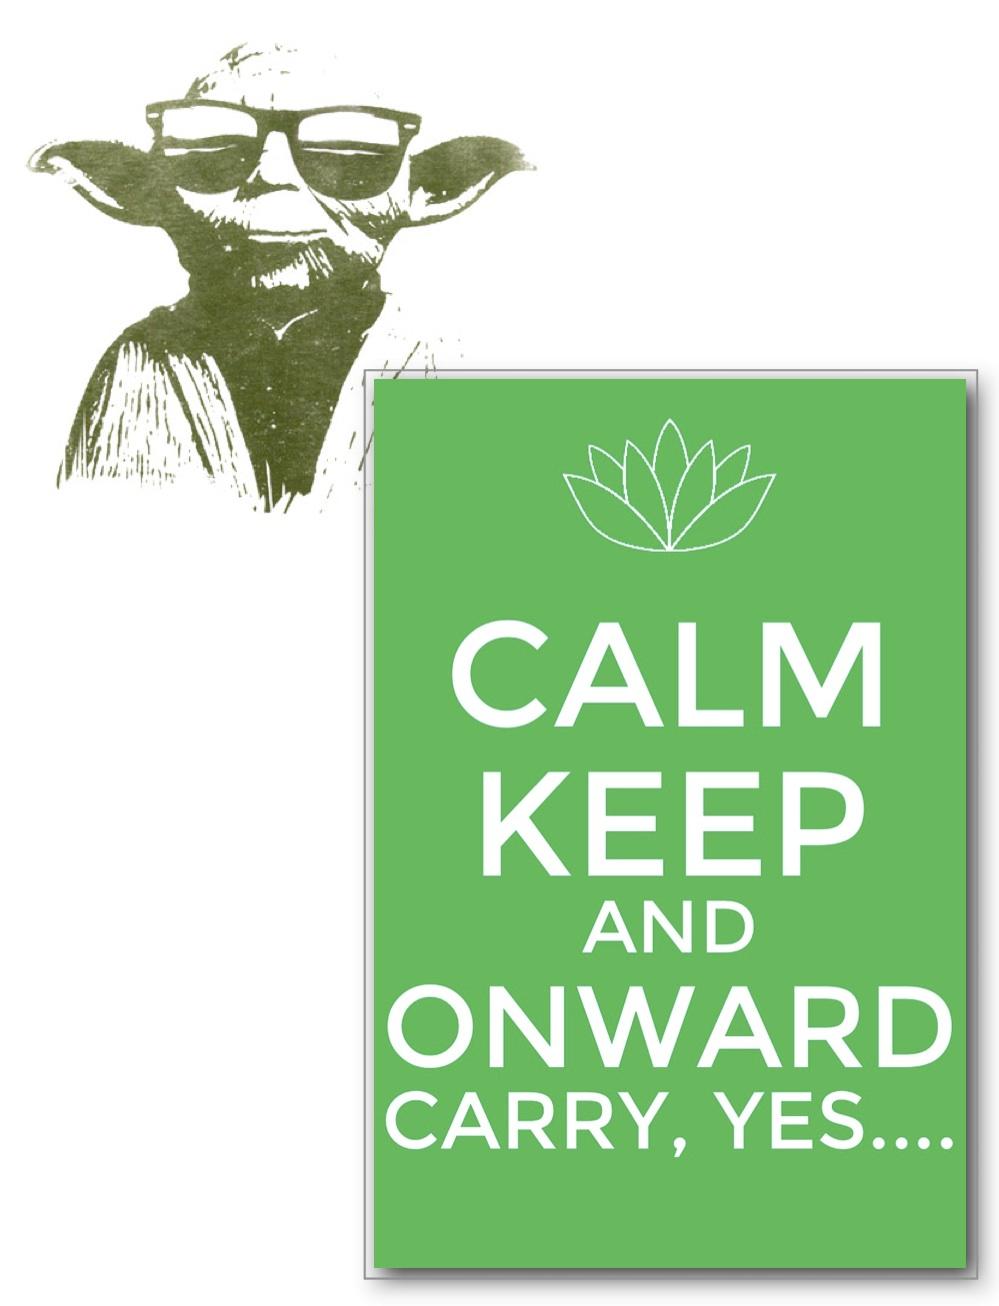 onward carry